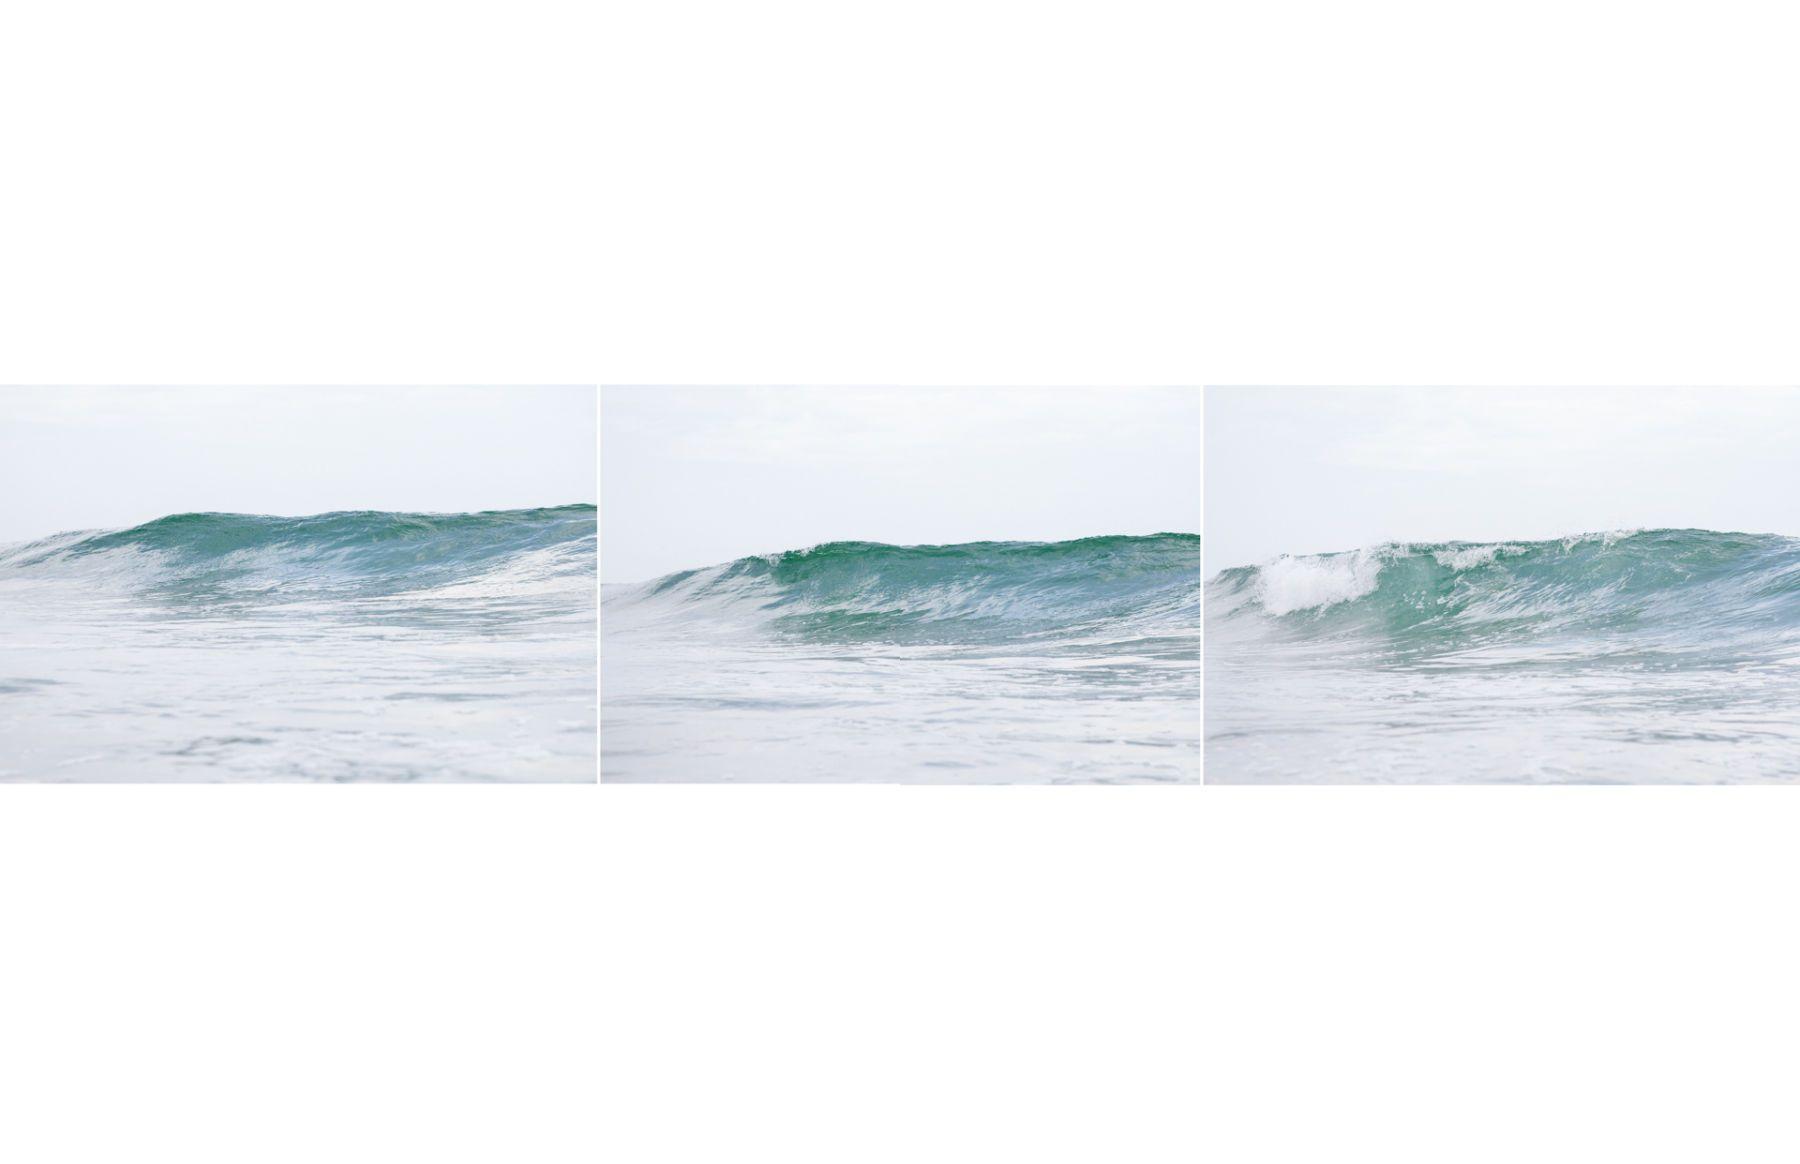 1surf_final___300_dpi_20.jpg